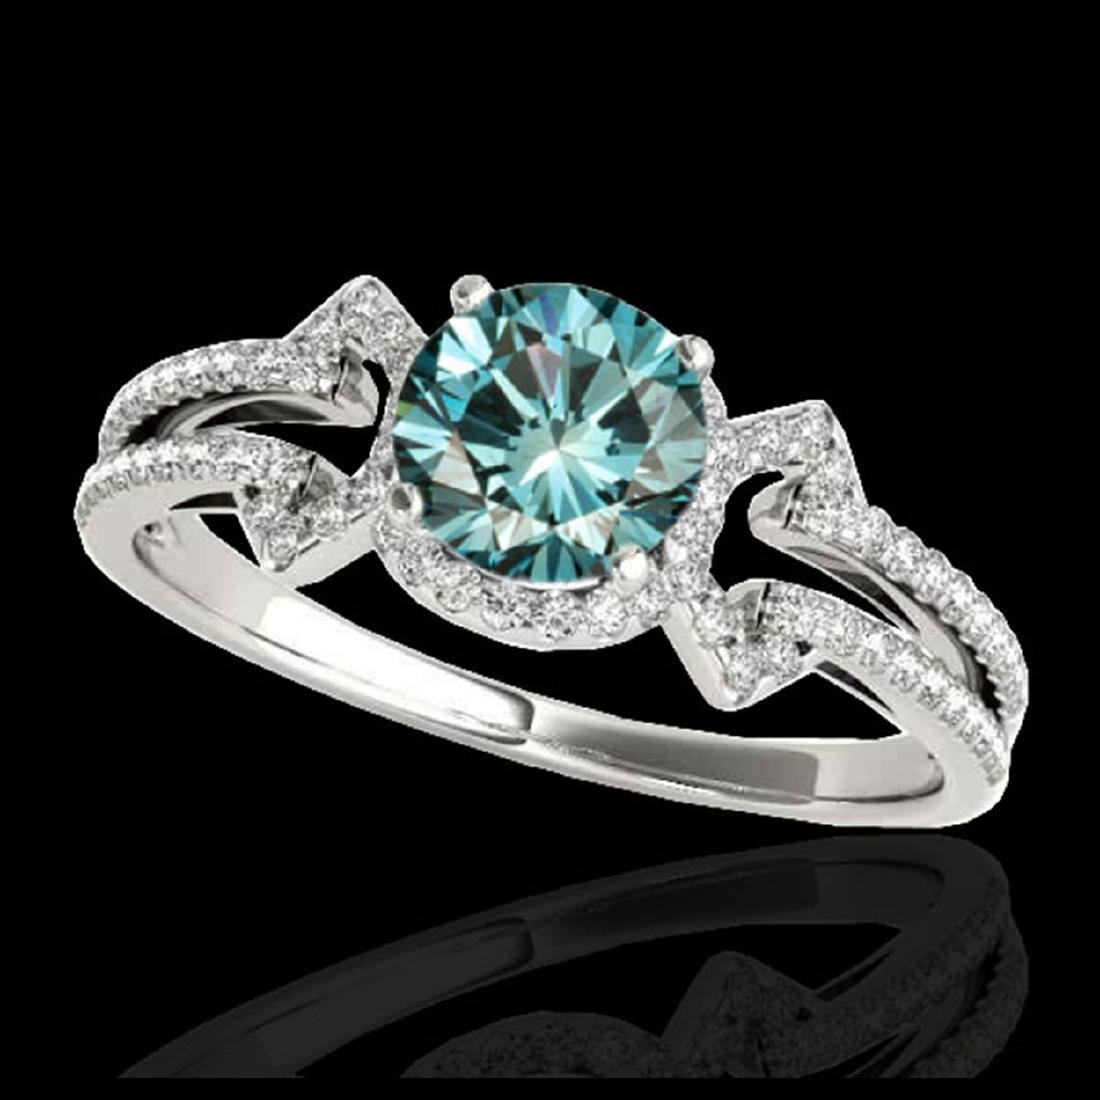 1.36 ctw SI Fancy Blue Diamond Solitaire Ring 10K White